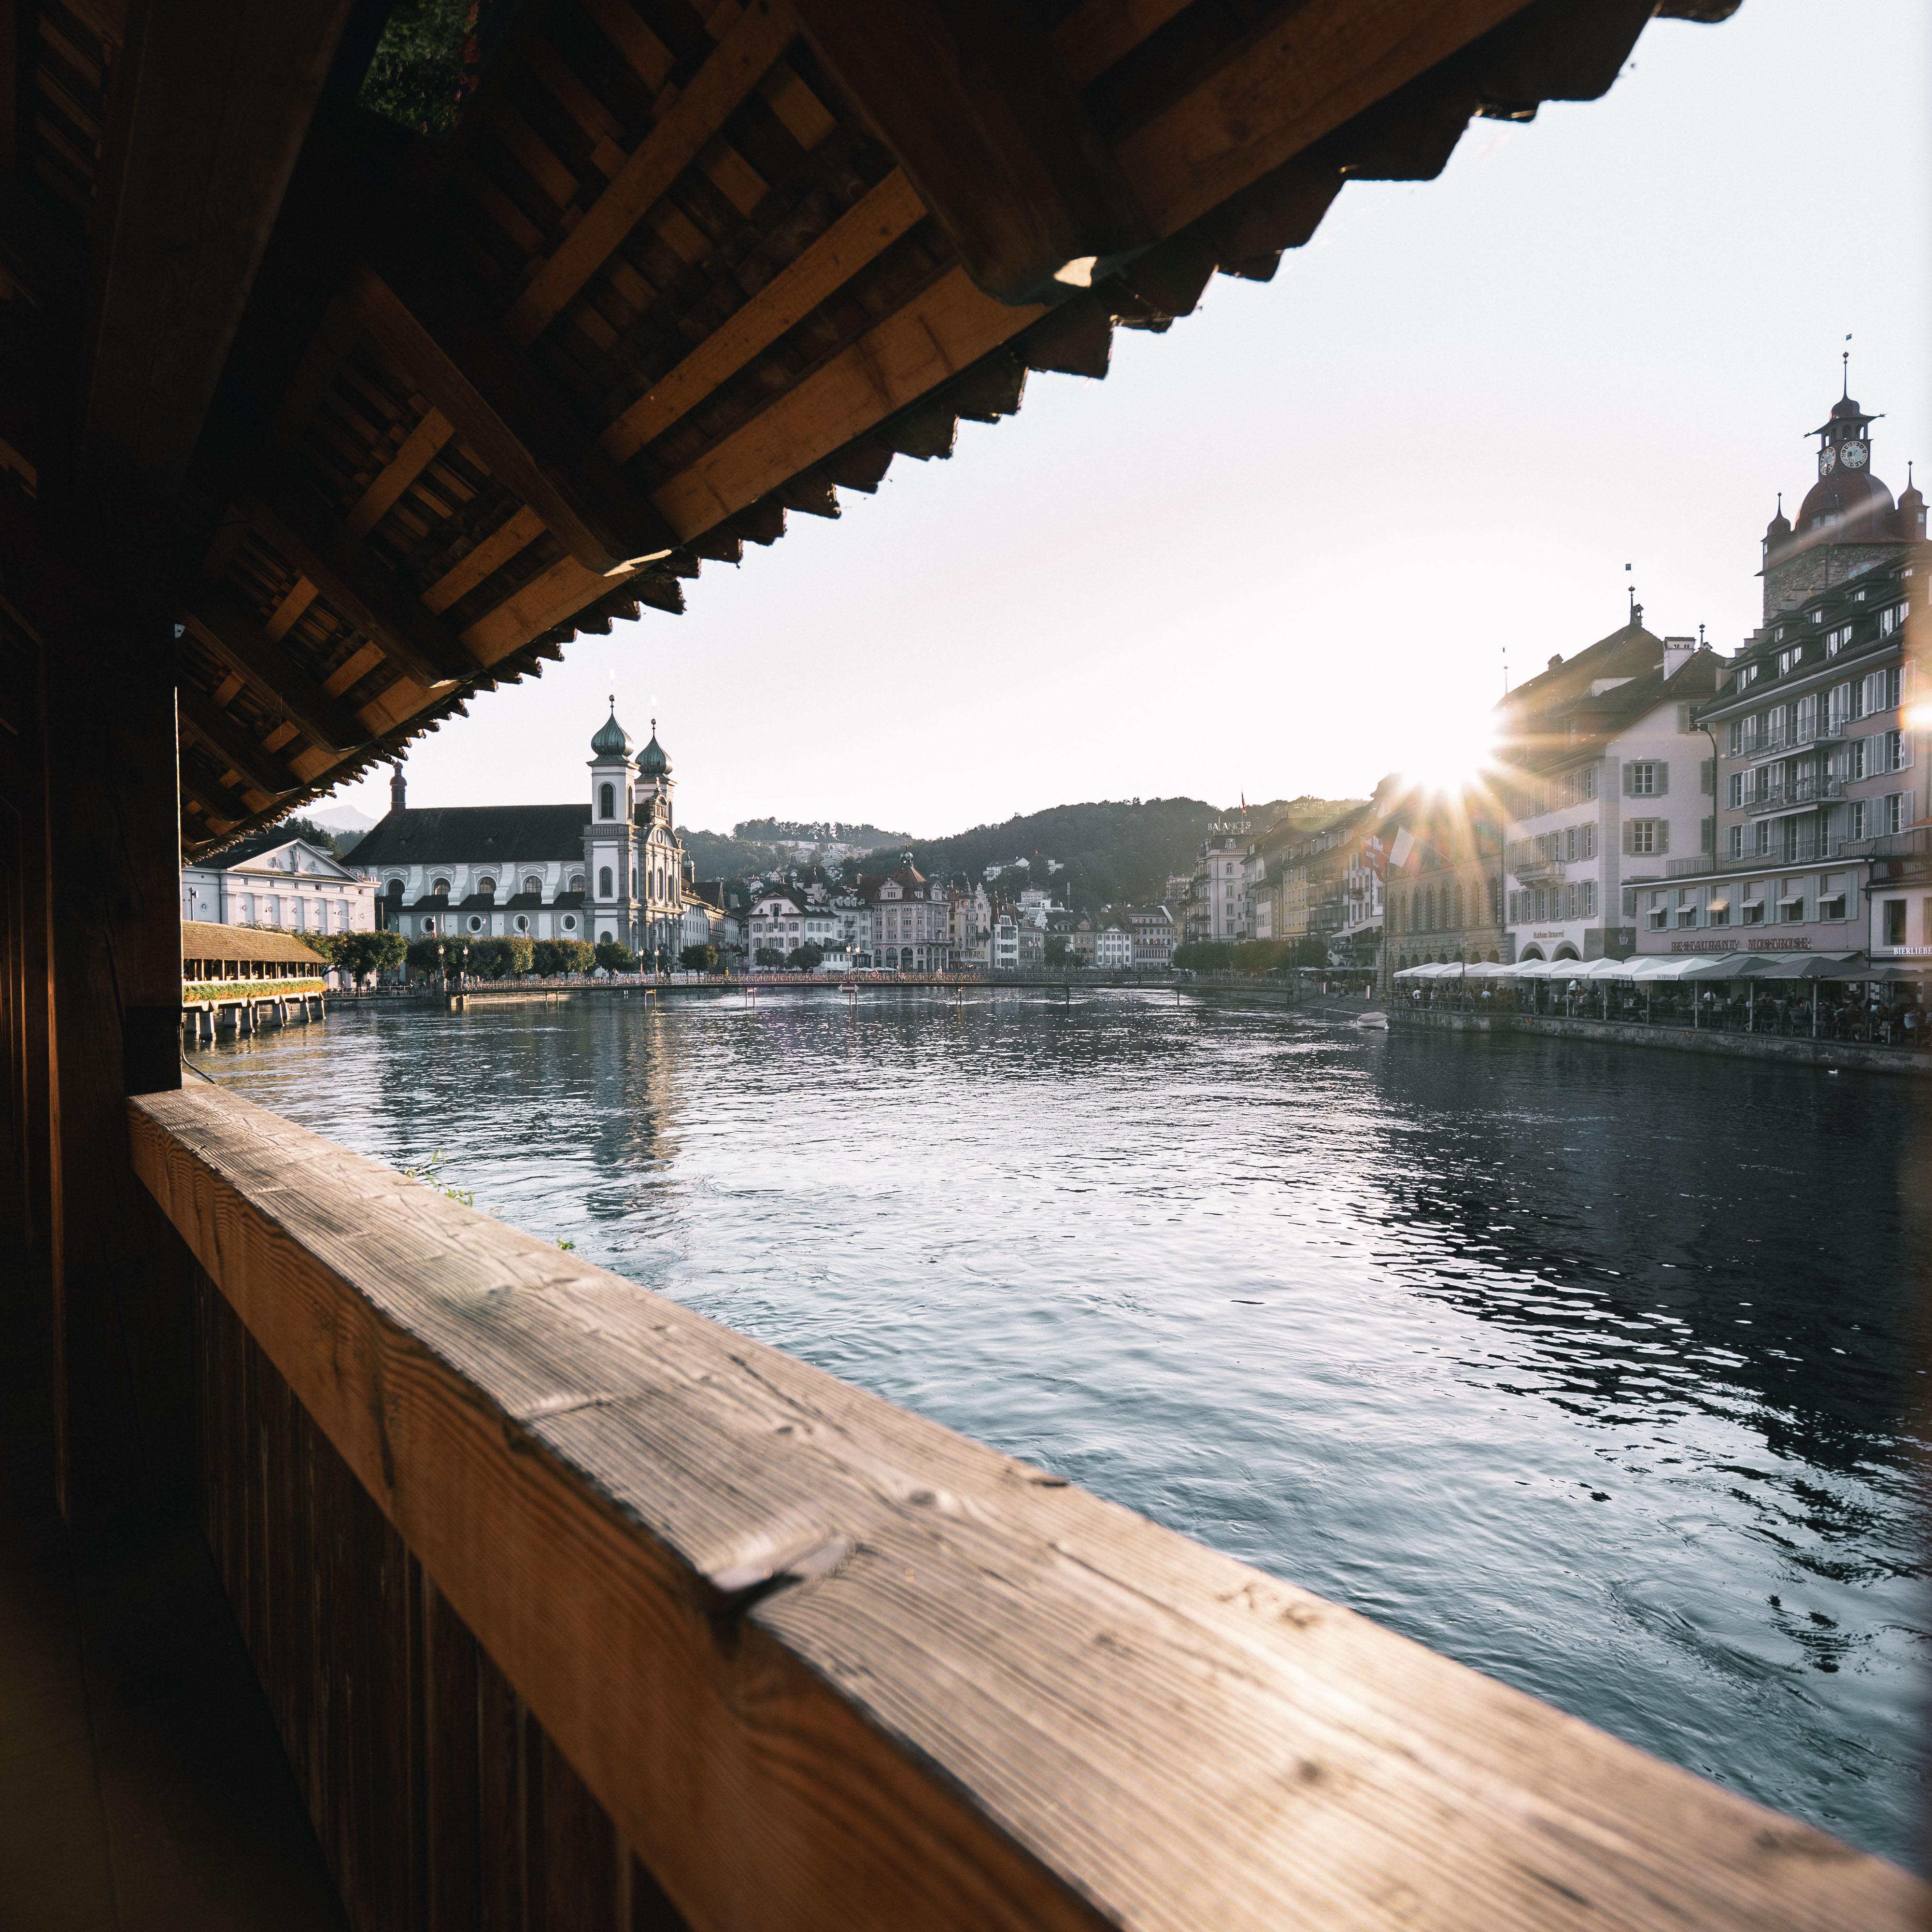 Sonnenuntergang auf der Kappelbrücke